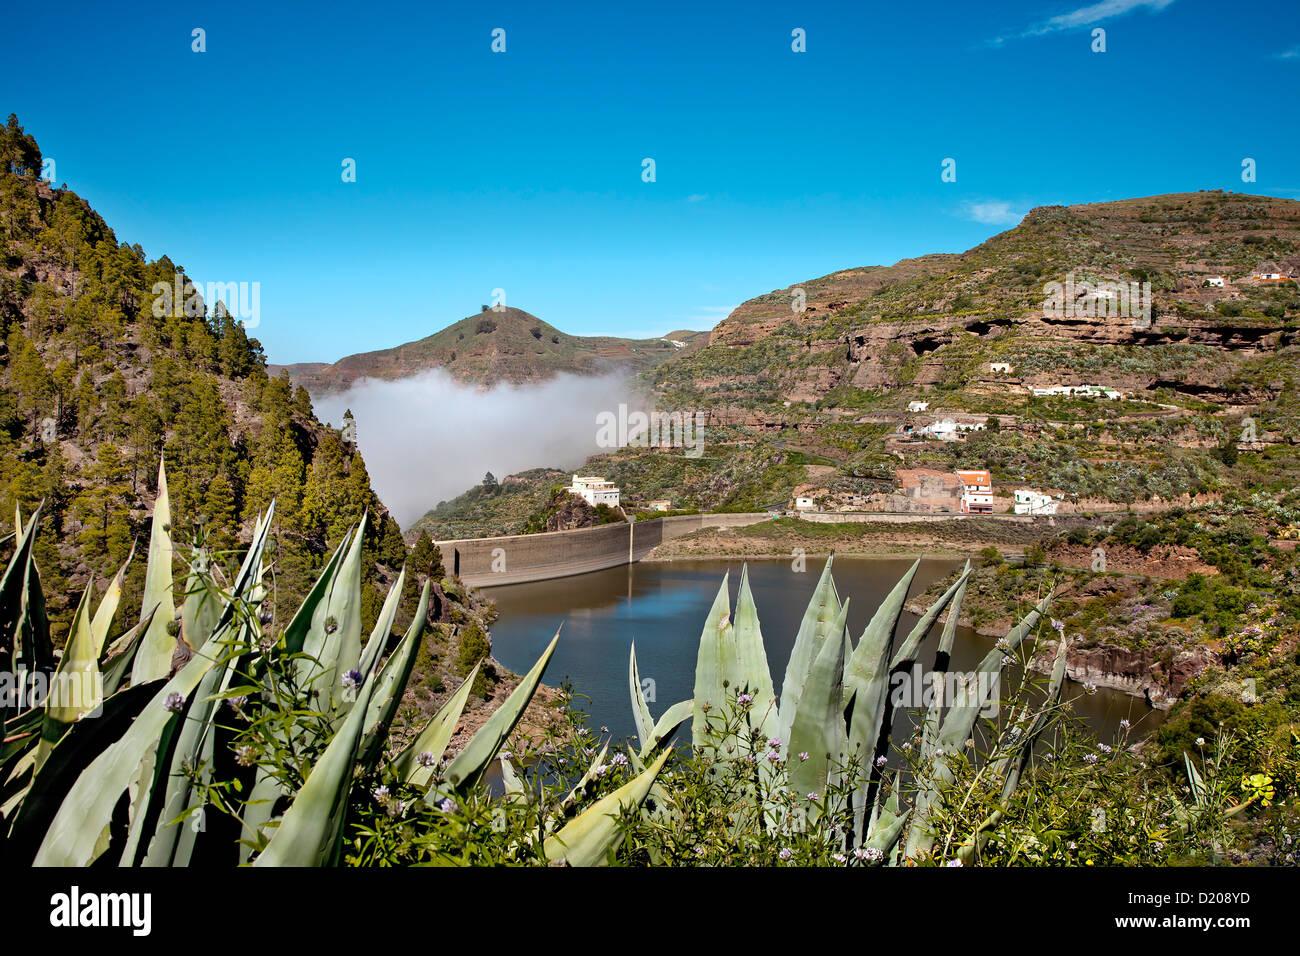 Cumulus cloud over the reservoir Embalse de Los Perez, Gran Canaria, Canary Islands, Spain - Stock Image